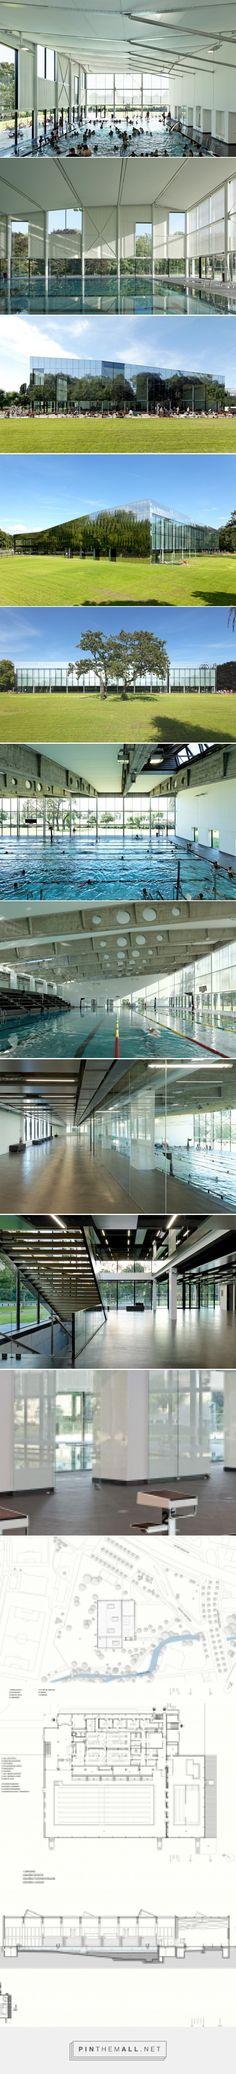 dietmar feichtinger architectes transforms swimming pool kibitzenau - created via http://pinthemall.net